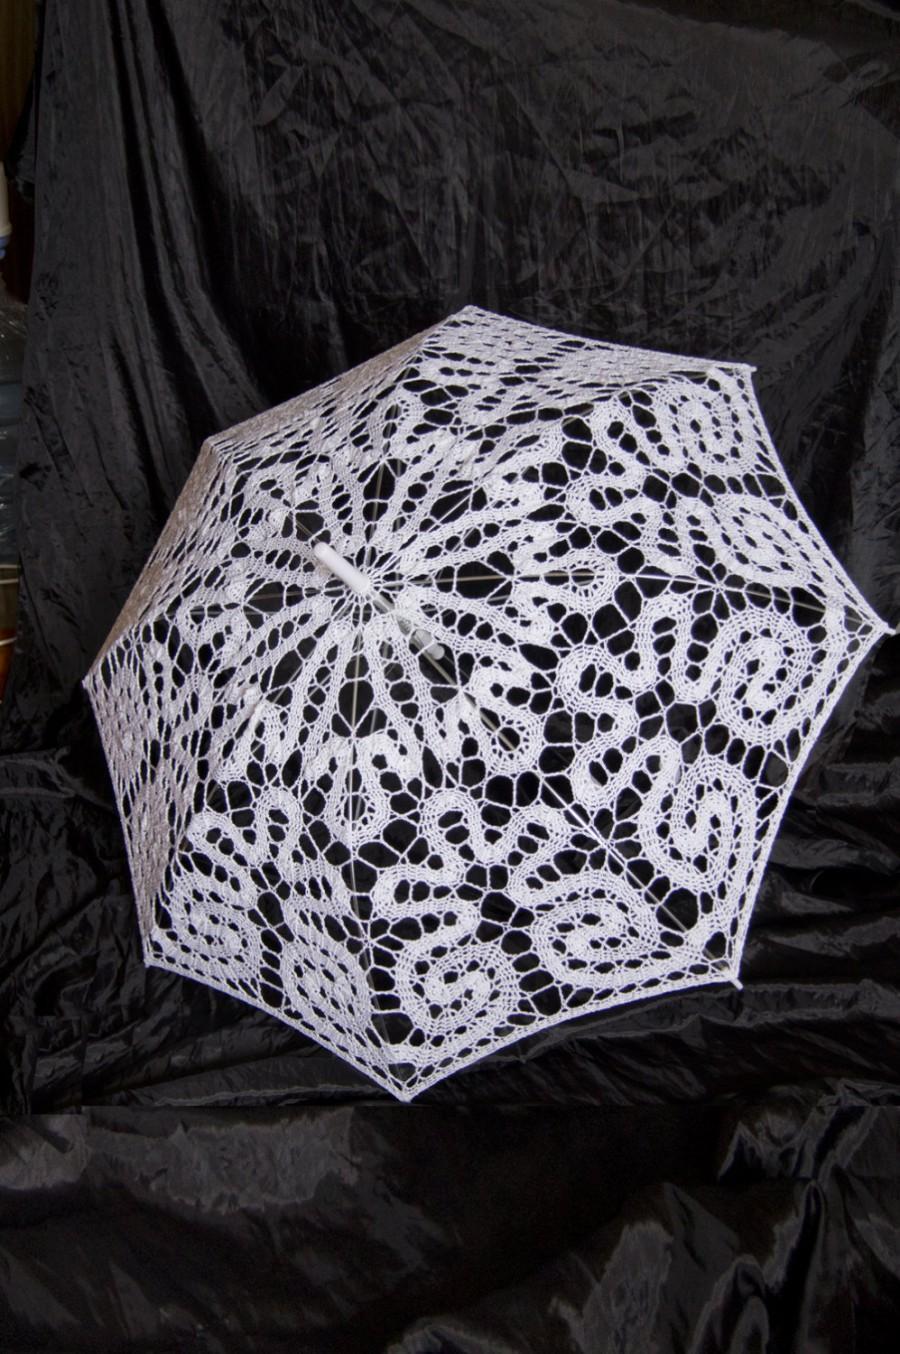 Mariage - Lace Floral Bridal Parasol Photo Shoot Movie Session Victorian White Vintage Wedding Accessories Crochet Sun Umbrella Parasol Theatre Props